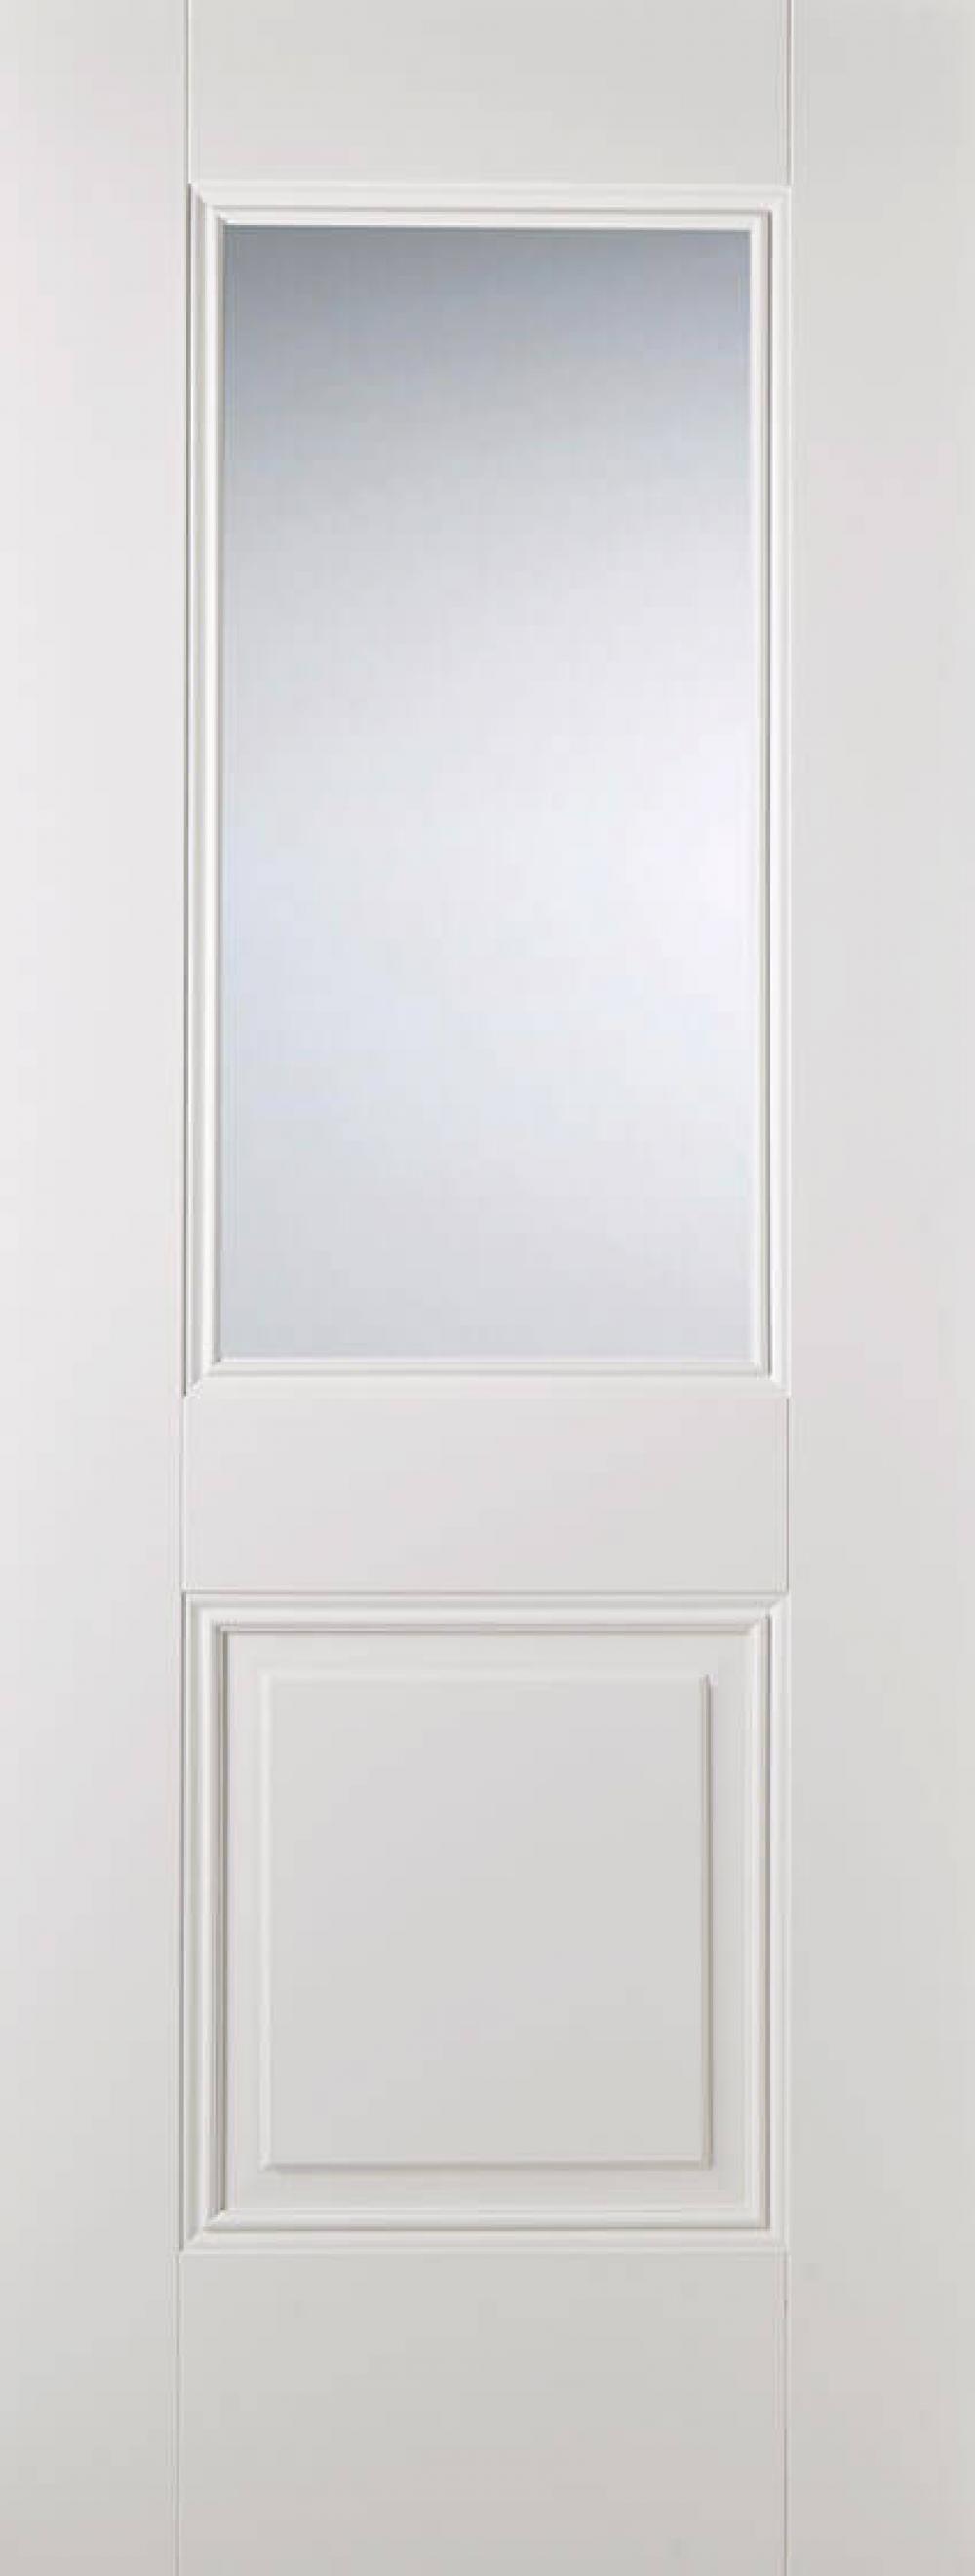 Arnhem White 1l/1p - Clear Glass Image